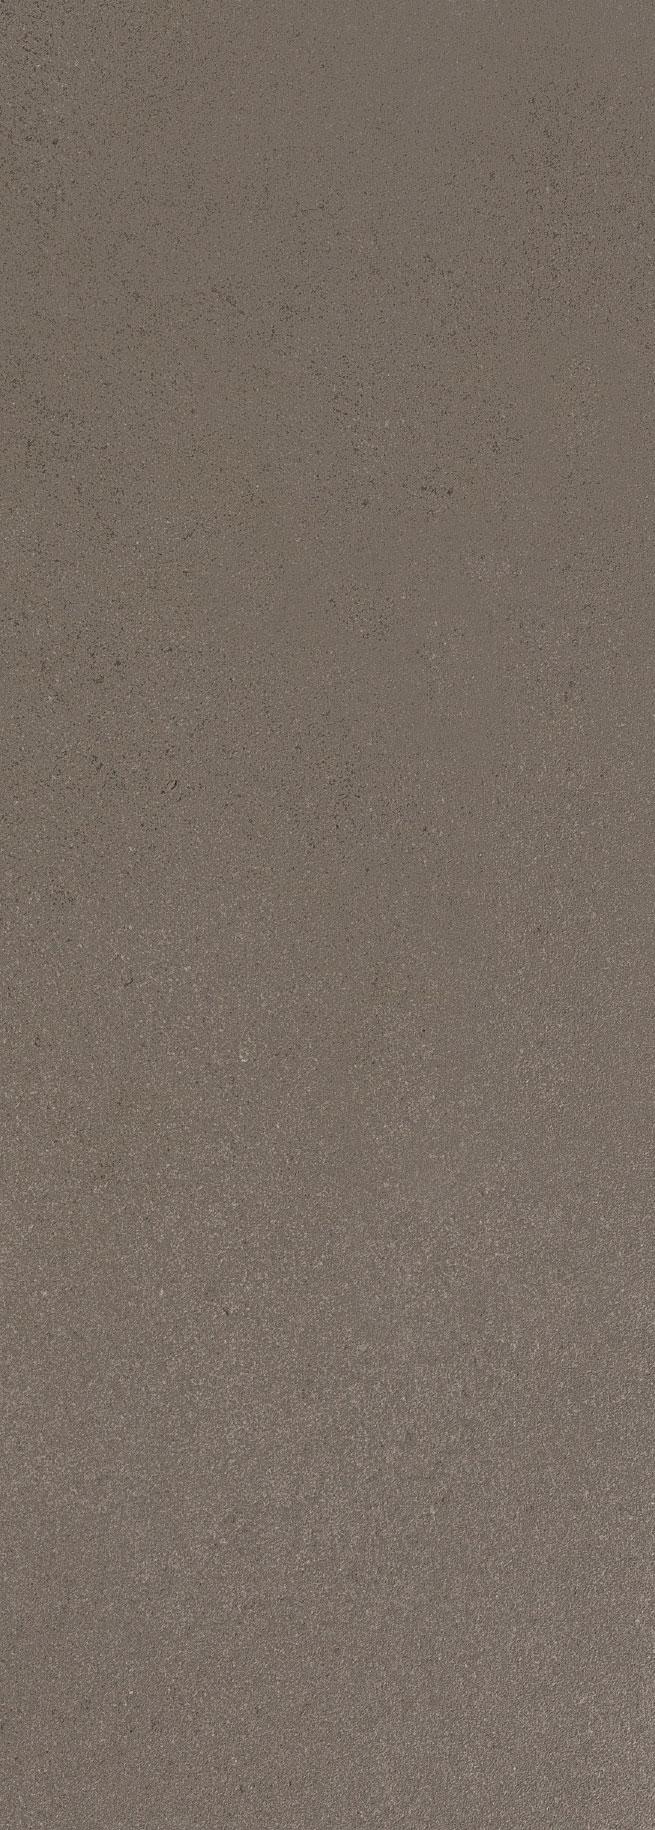 Living Ceramics Ground 90x90 Antracite-0